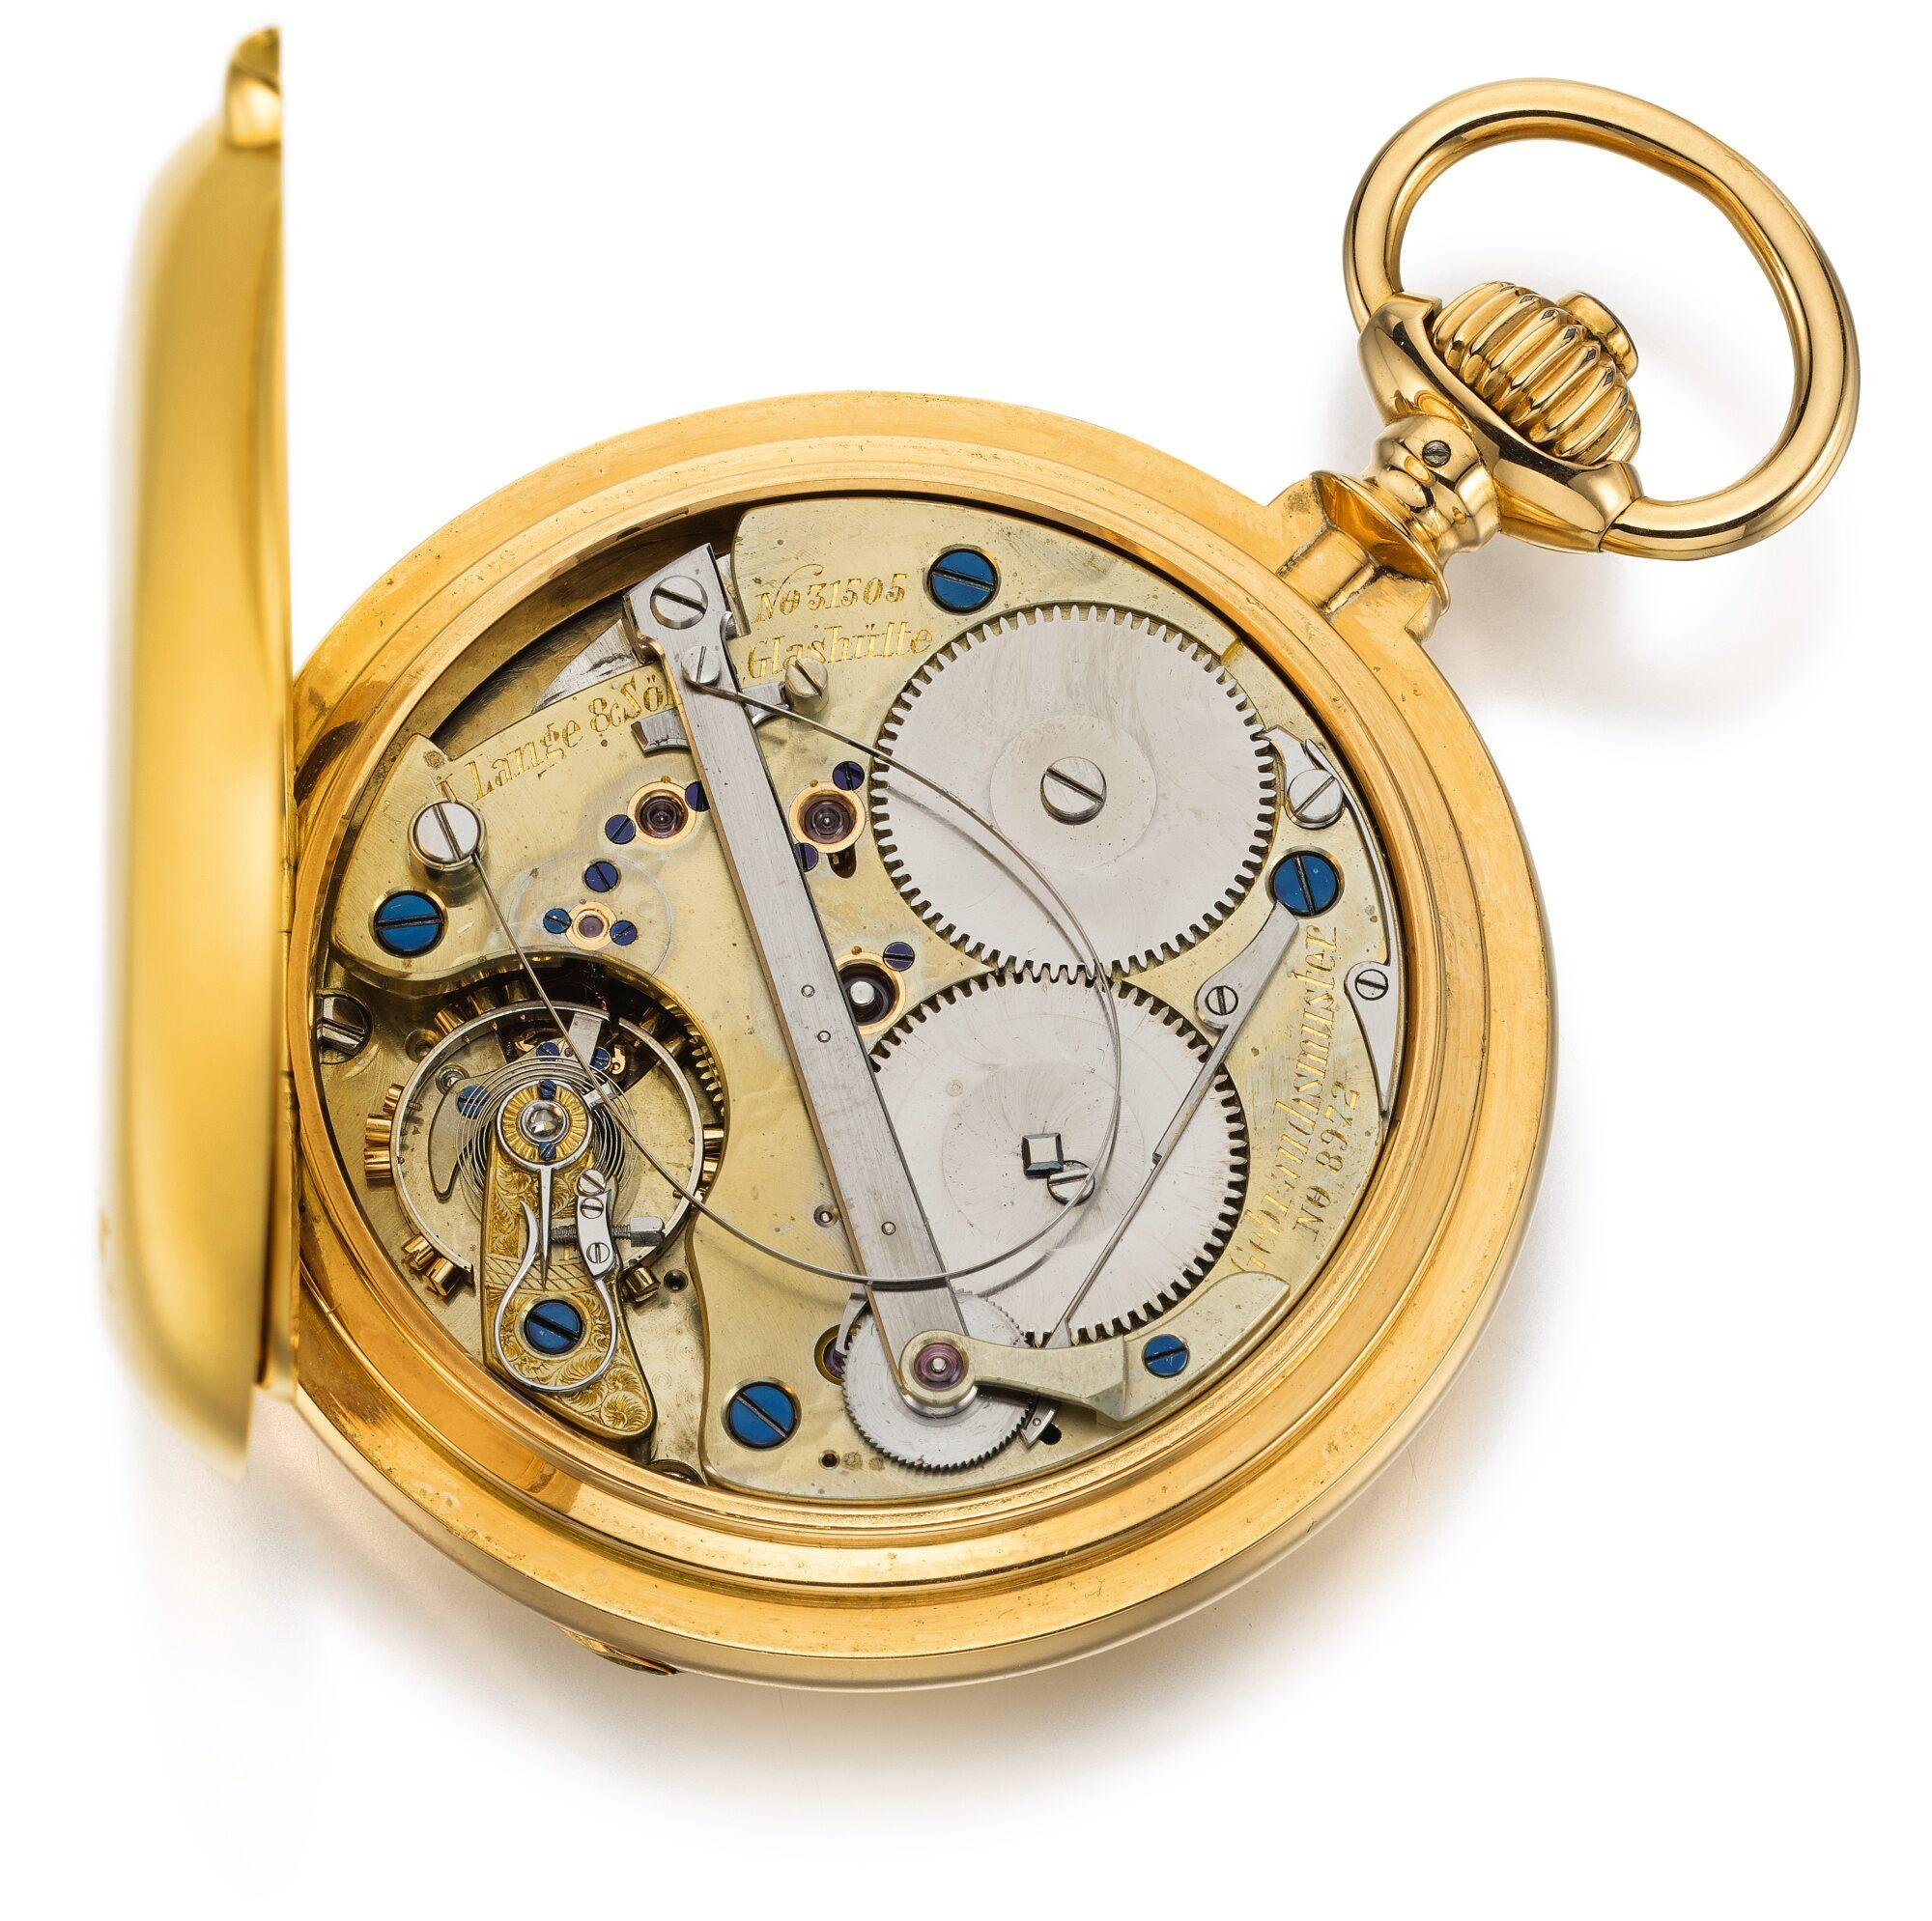 A Lange sohne automatic self winding pocket watch